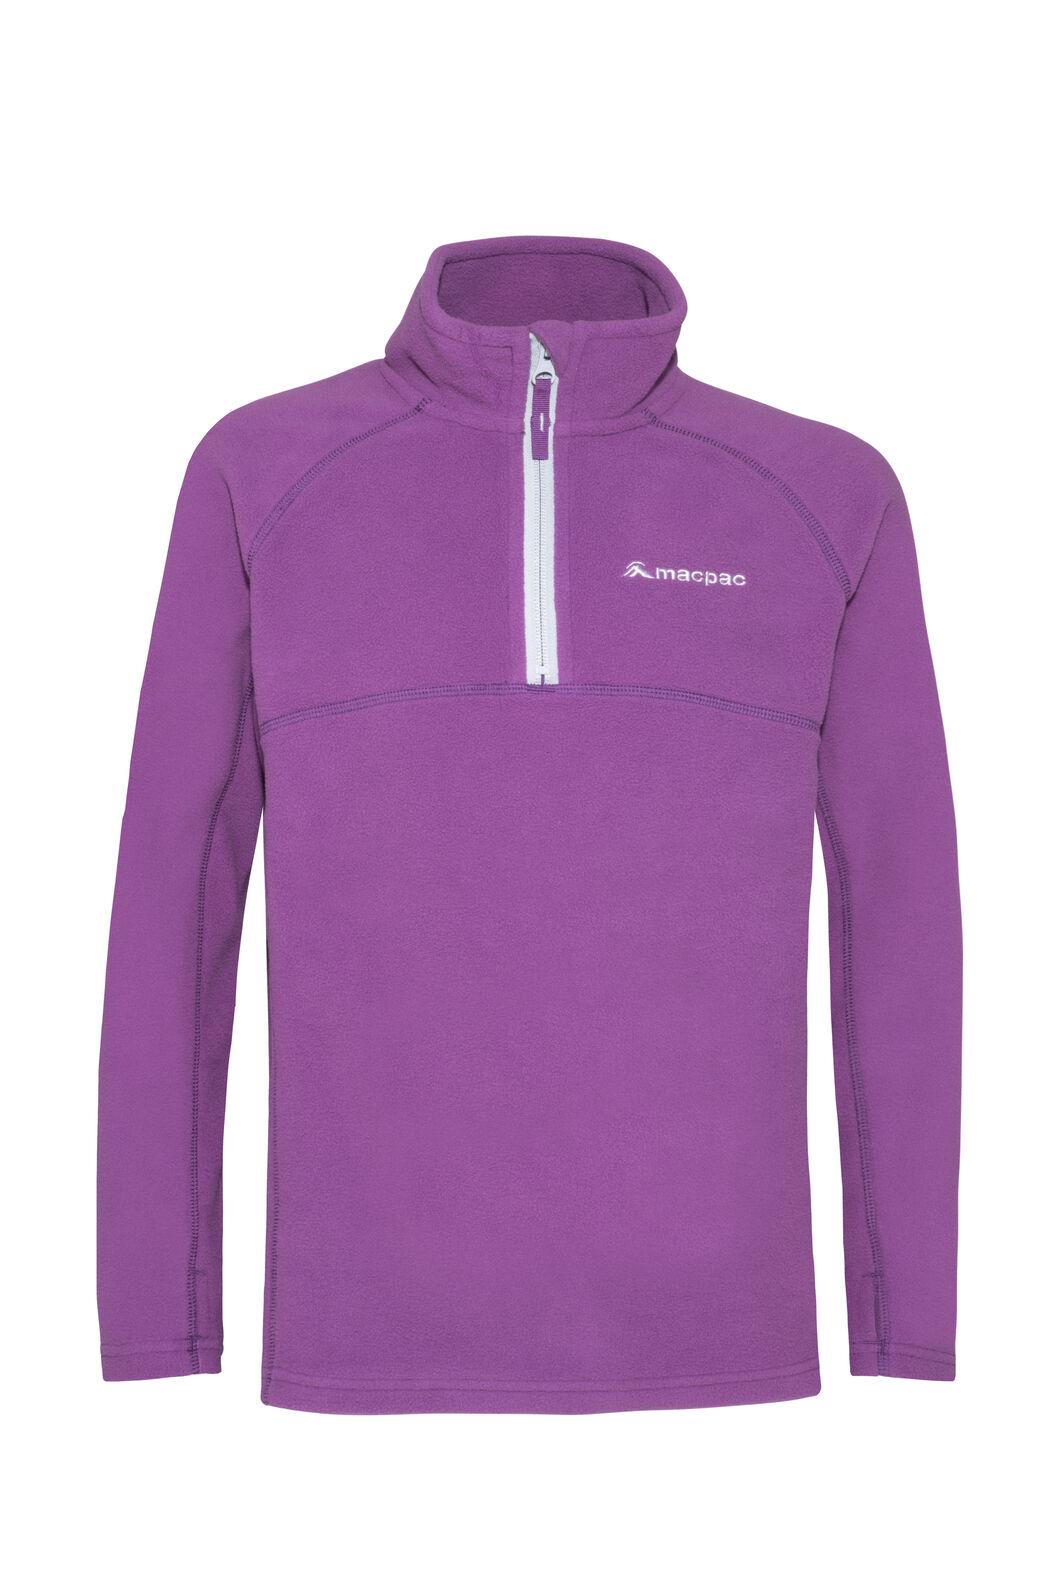 Macpac Tui Polartec® Fleece Pullover — Kids', Wood Violet, hi-res